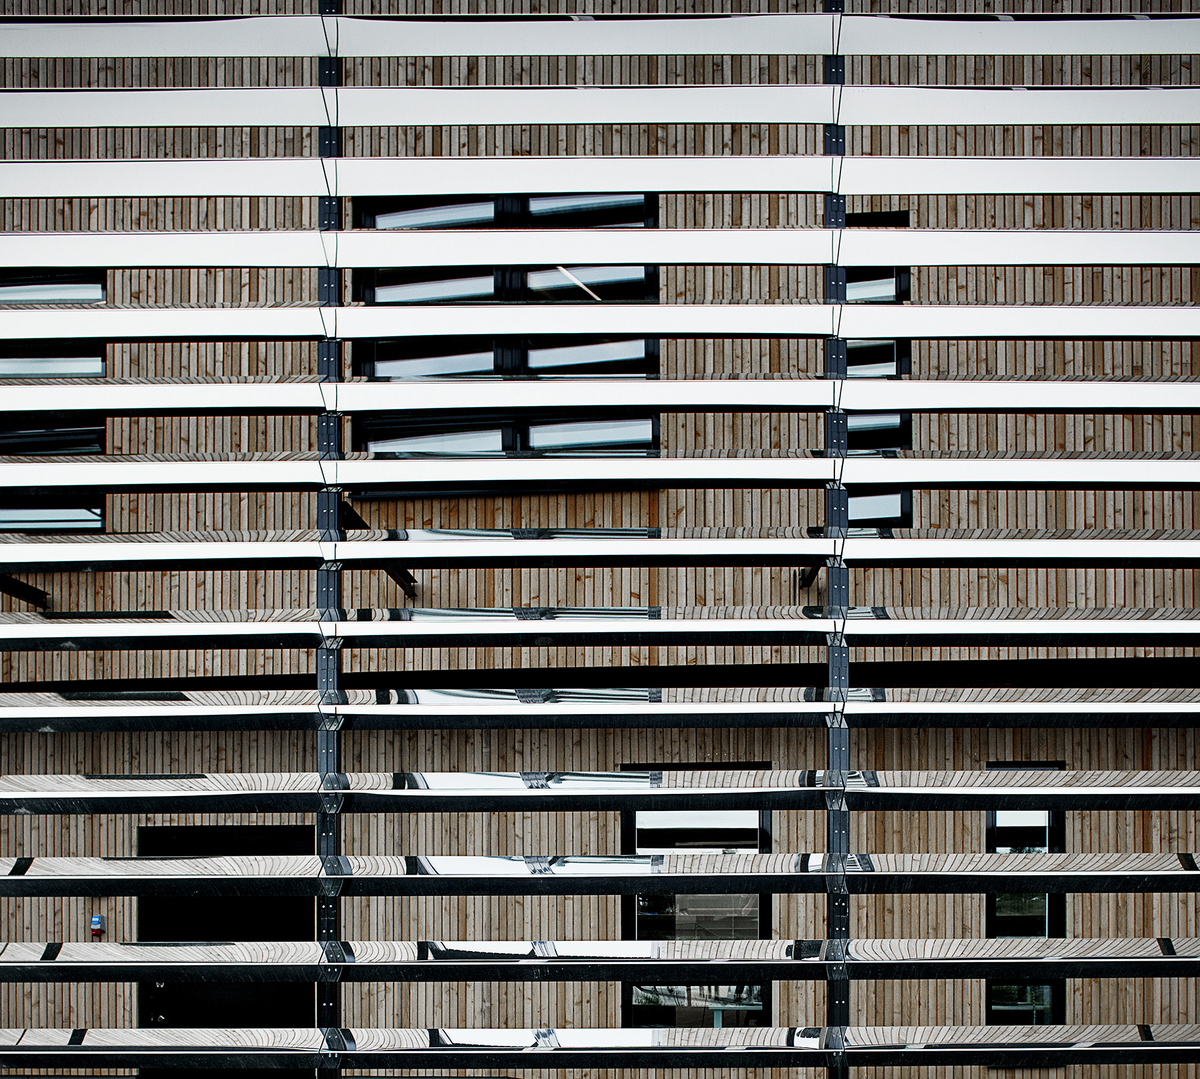 Exterior_gradient of the steel lamellaes_Foto Kåre Viemose